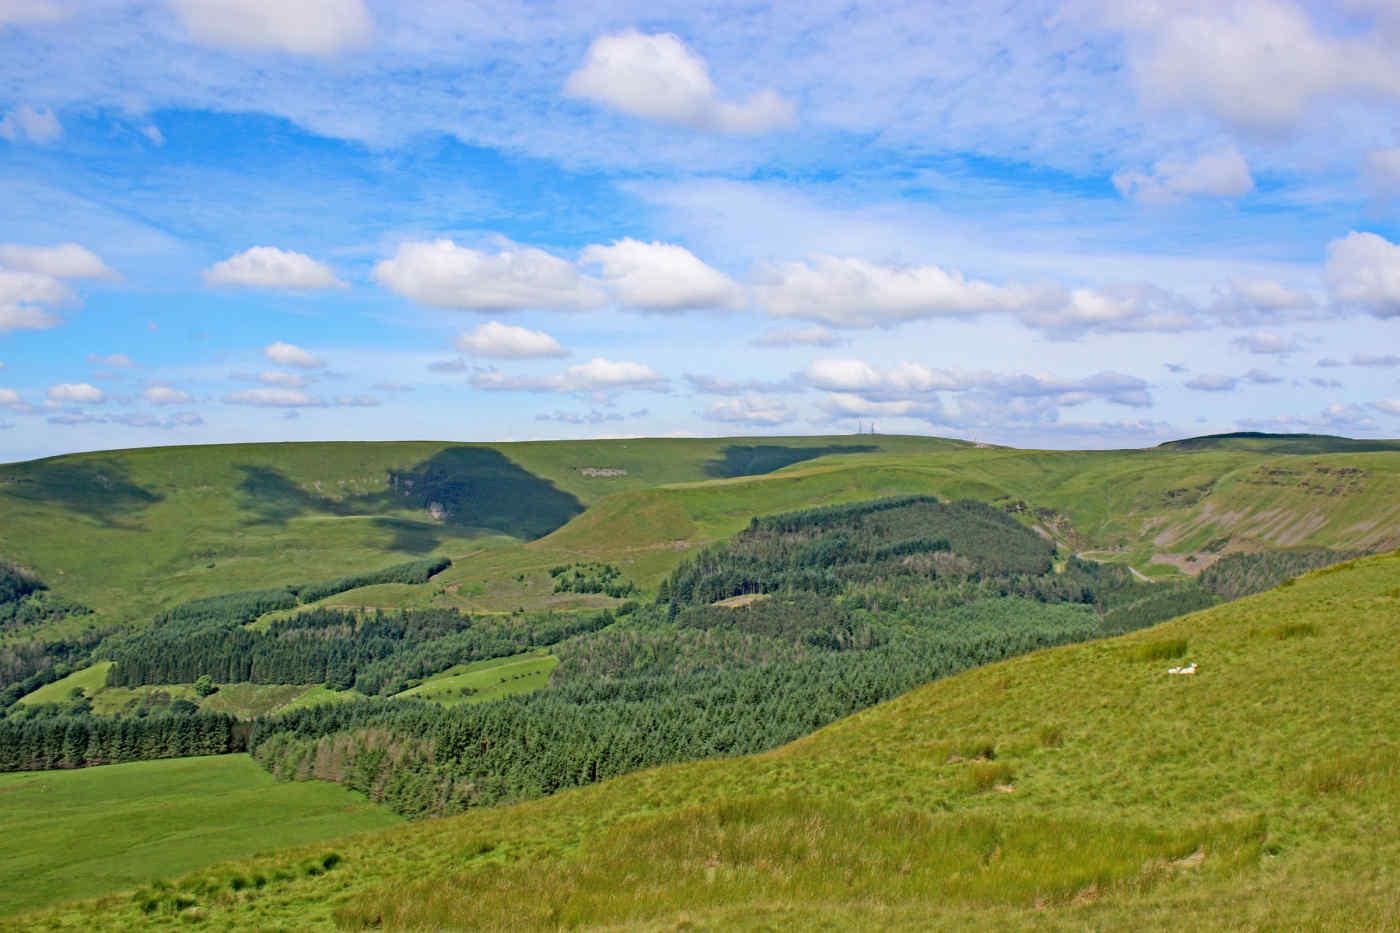 Brecon Beacons National Park • Brecon, Wales